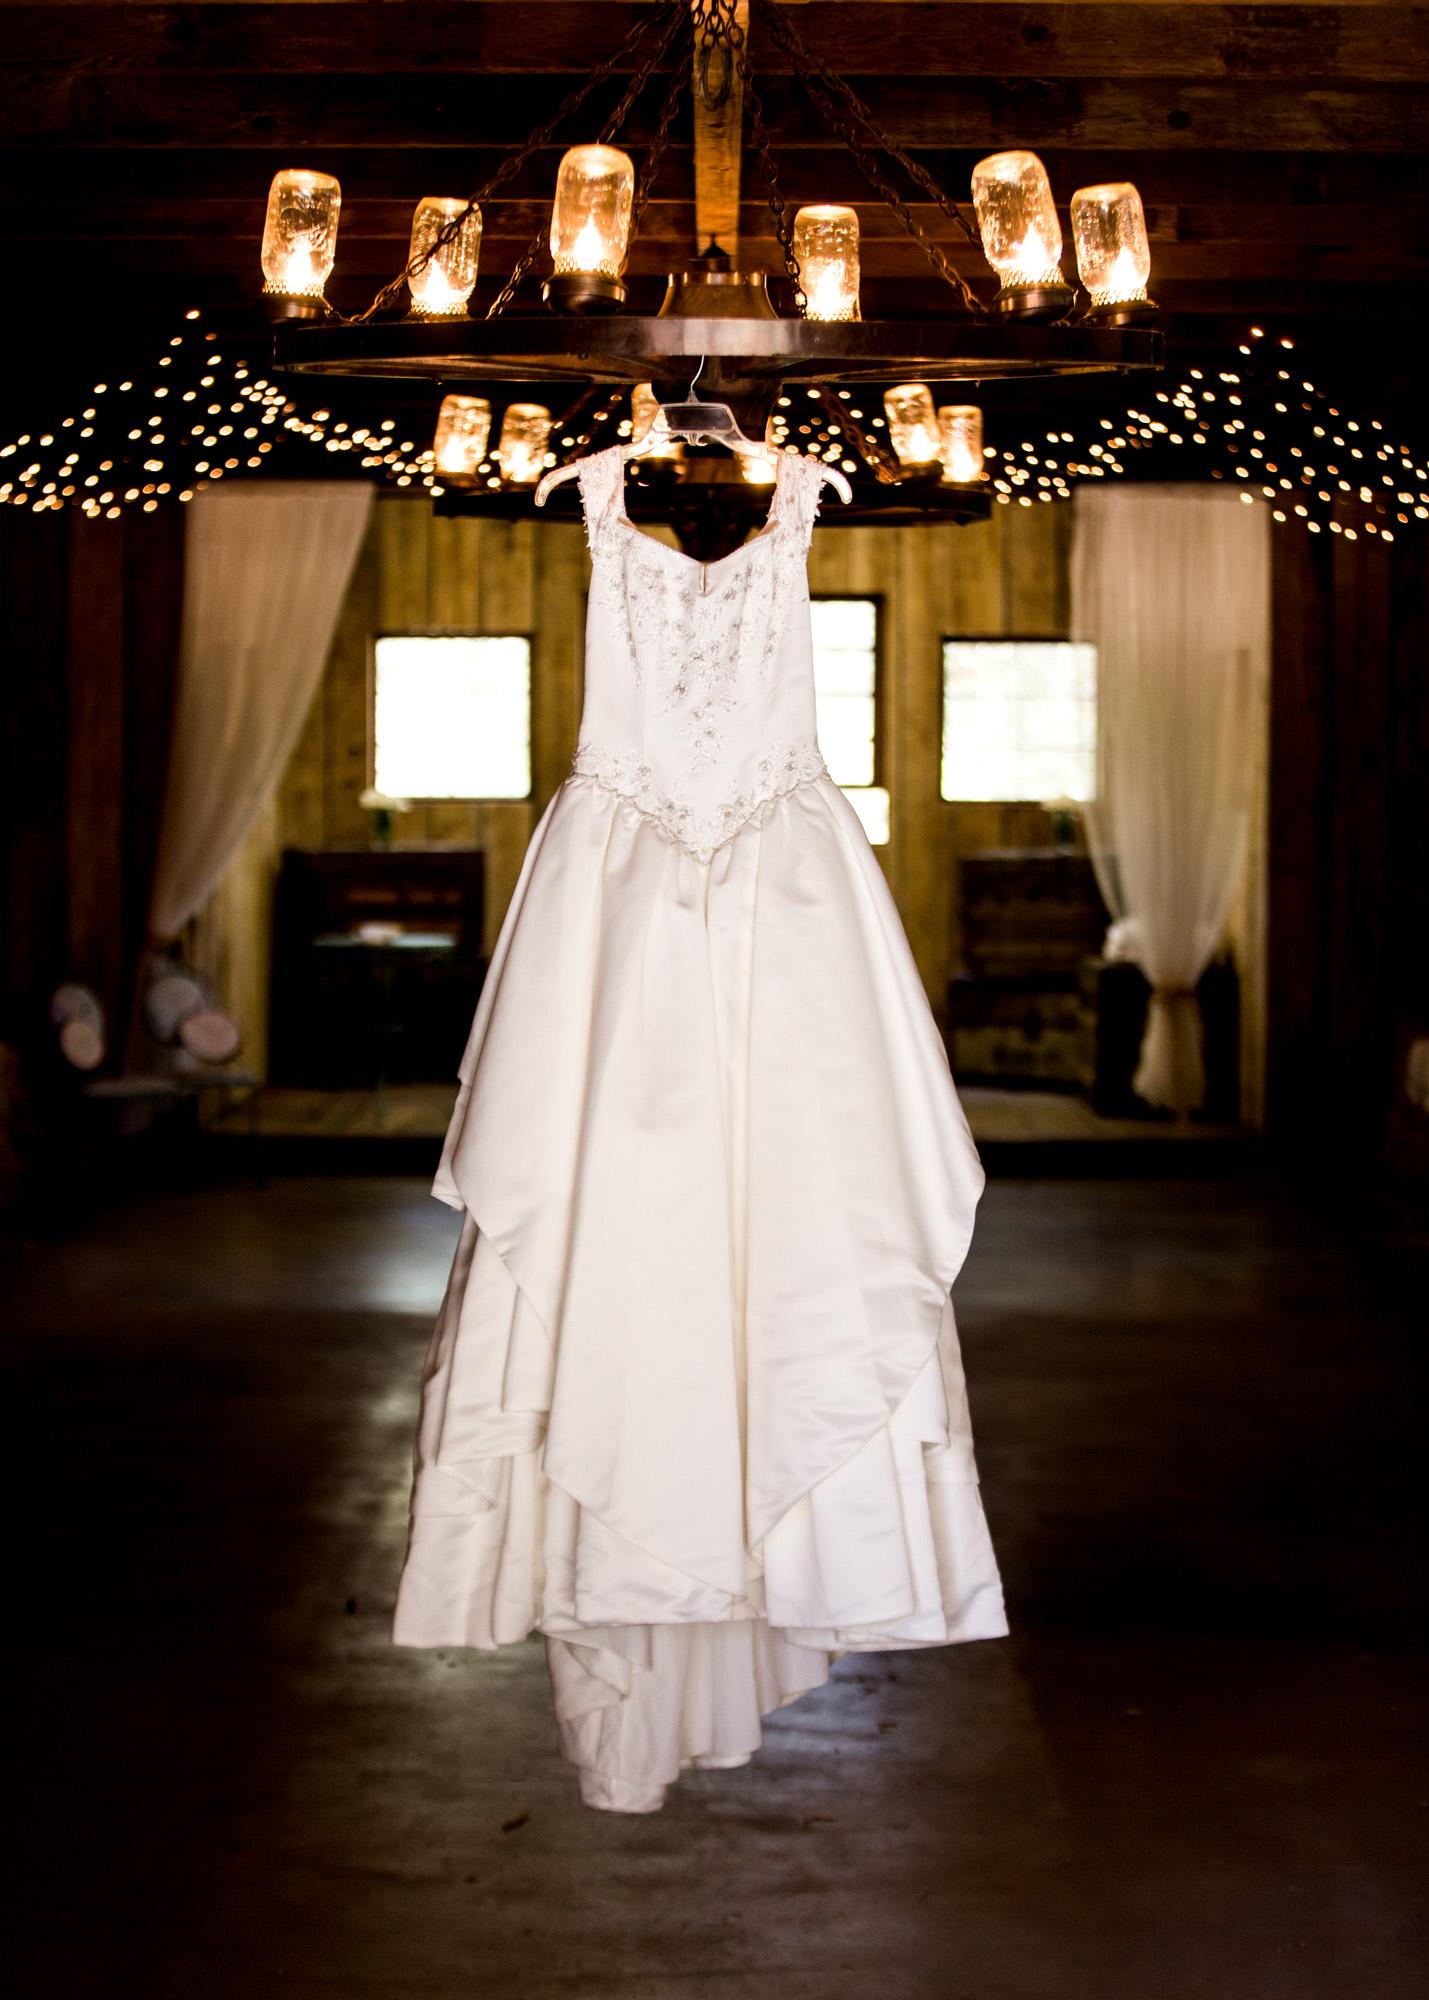 dress detail shot